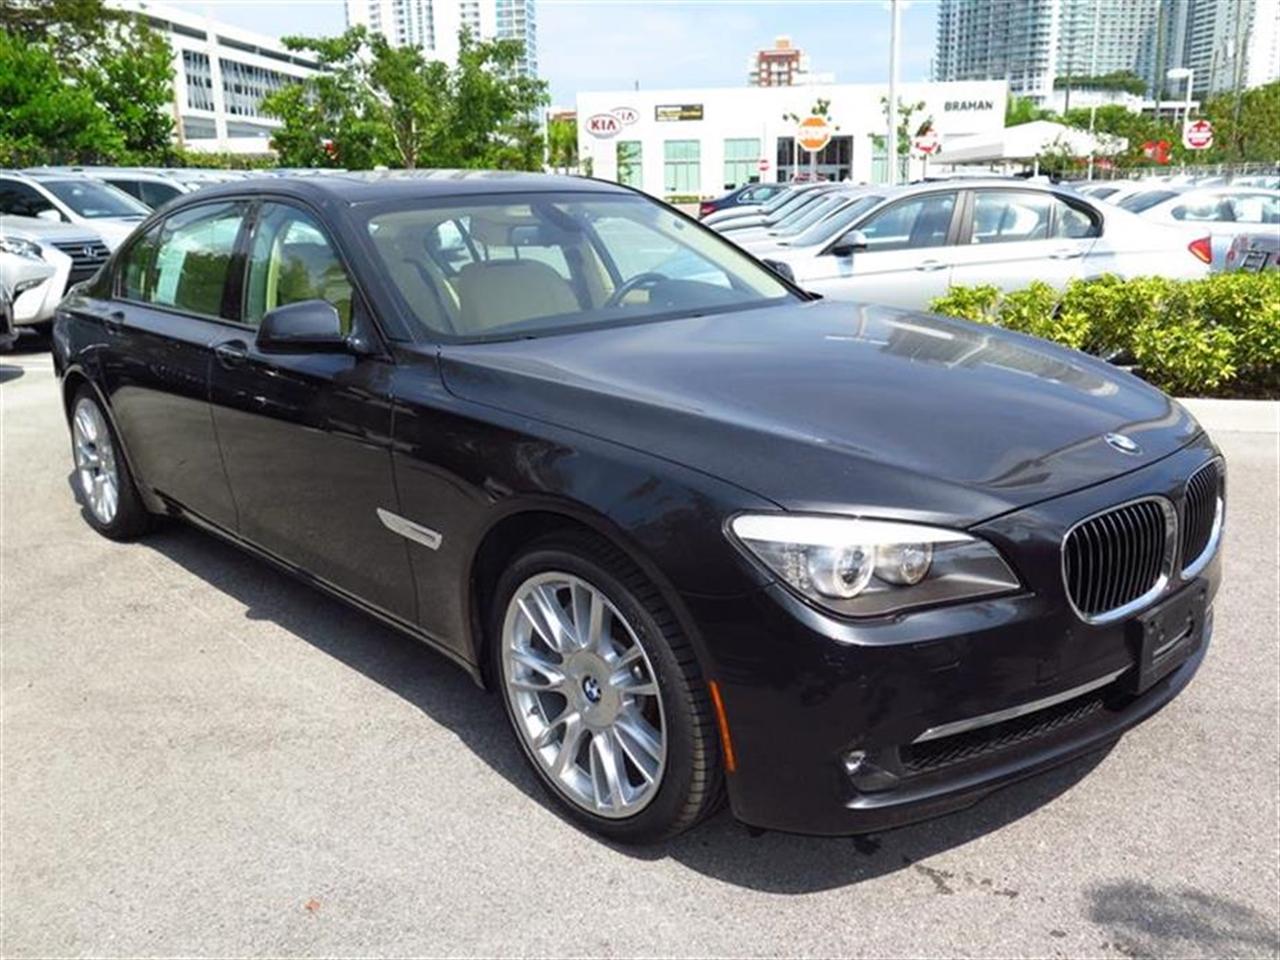 2012 BMW 7 SERIES 4dr Sdn 750Li RWD 27579 miles 4-zone automatic climate control -inc draft-free